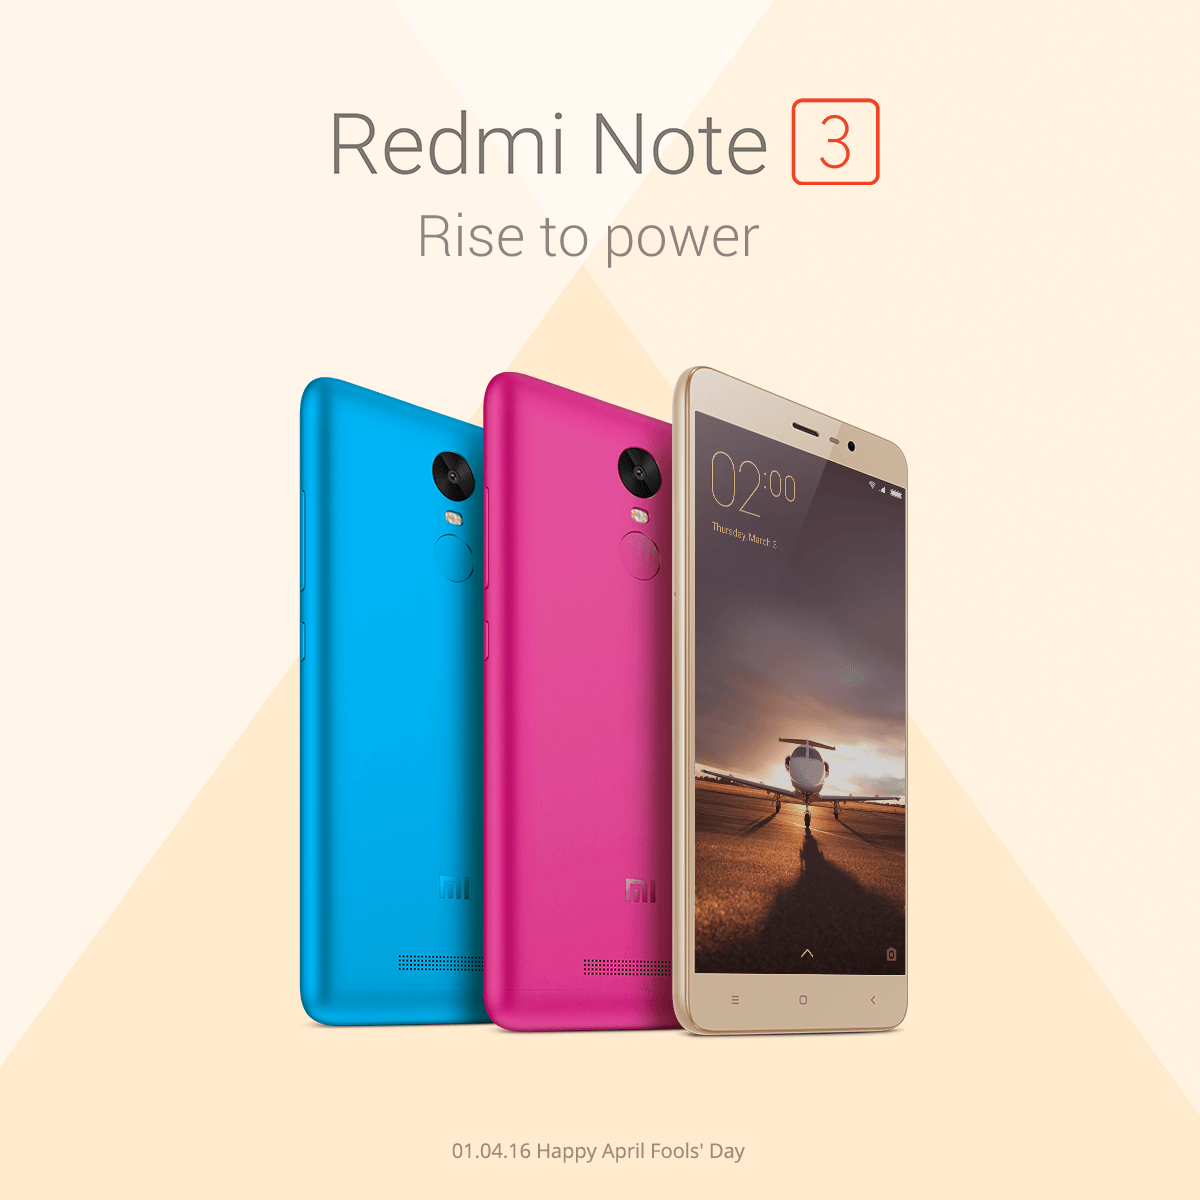 Guide How To Restore The Imei Of Xiaomi Redmi Note 3 Mediatek